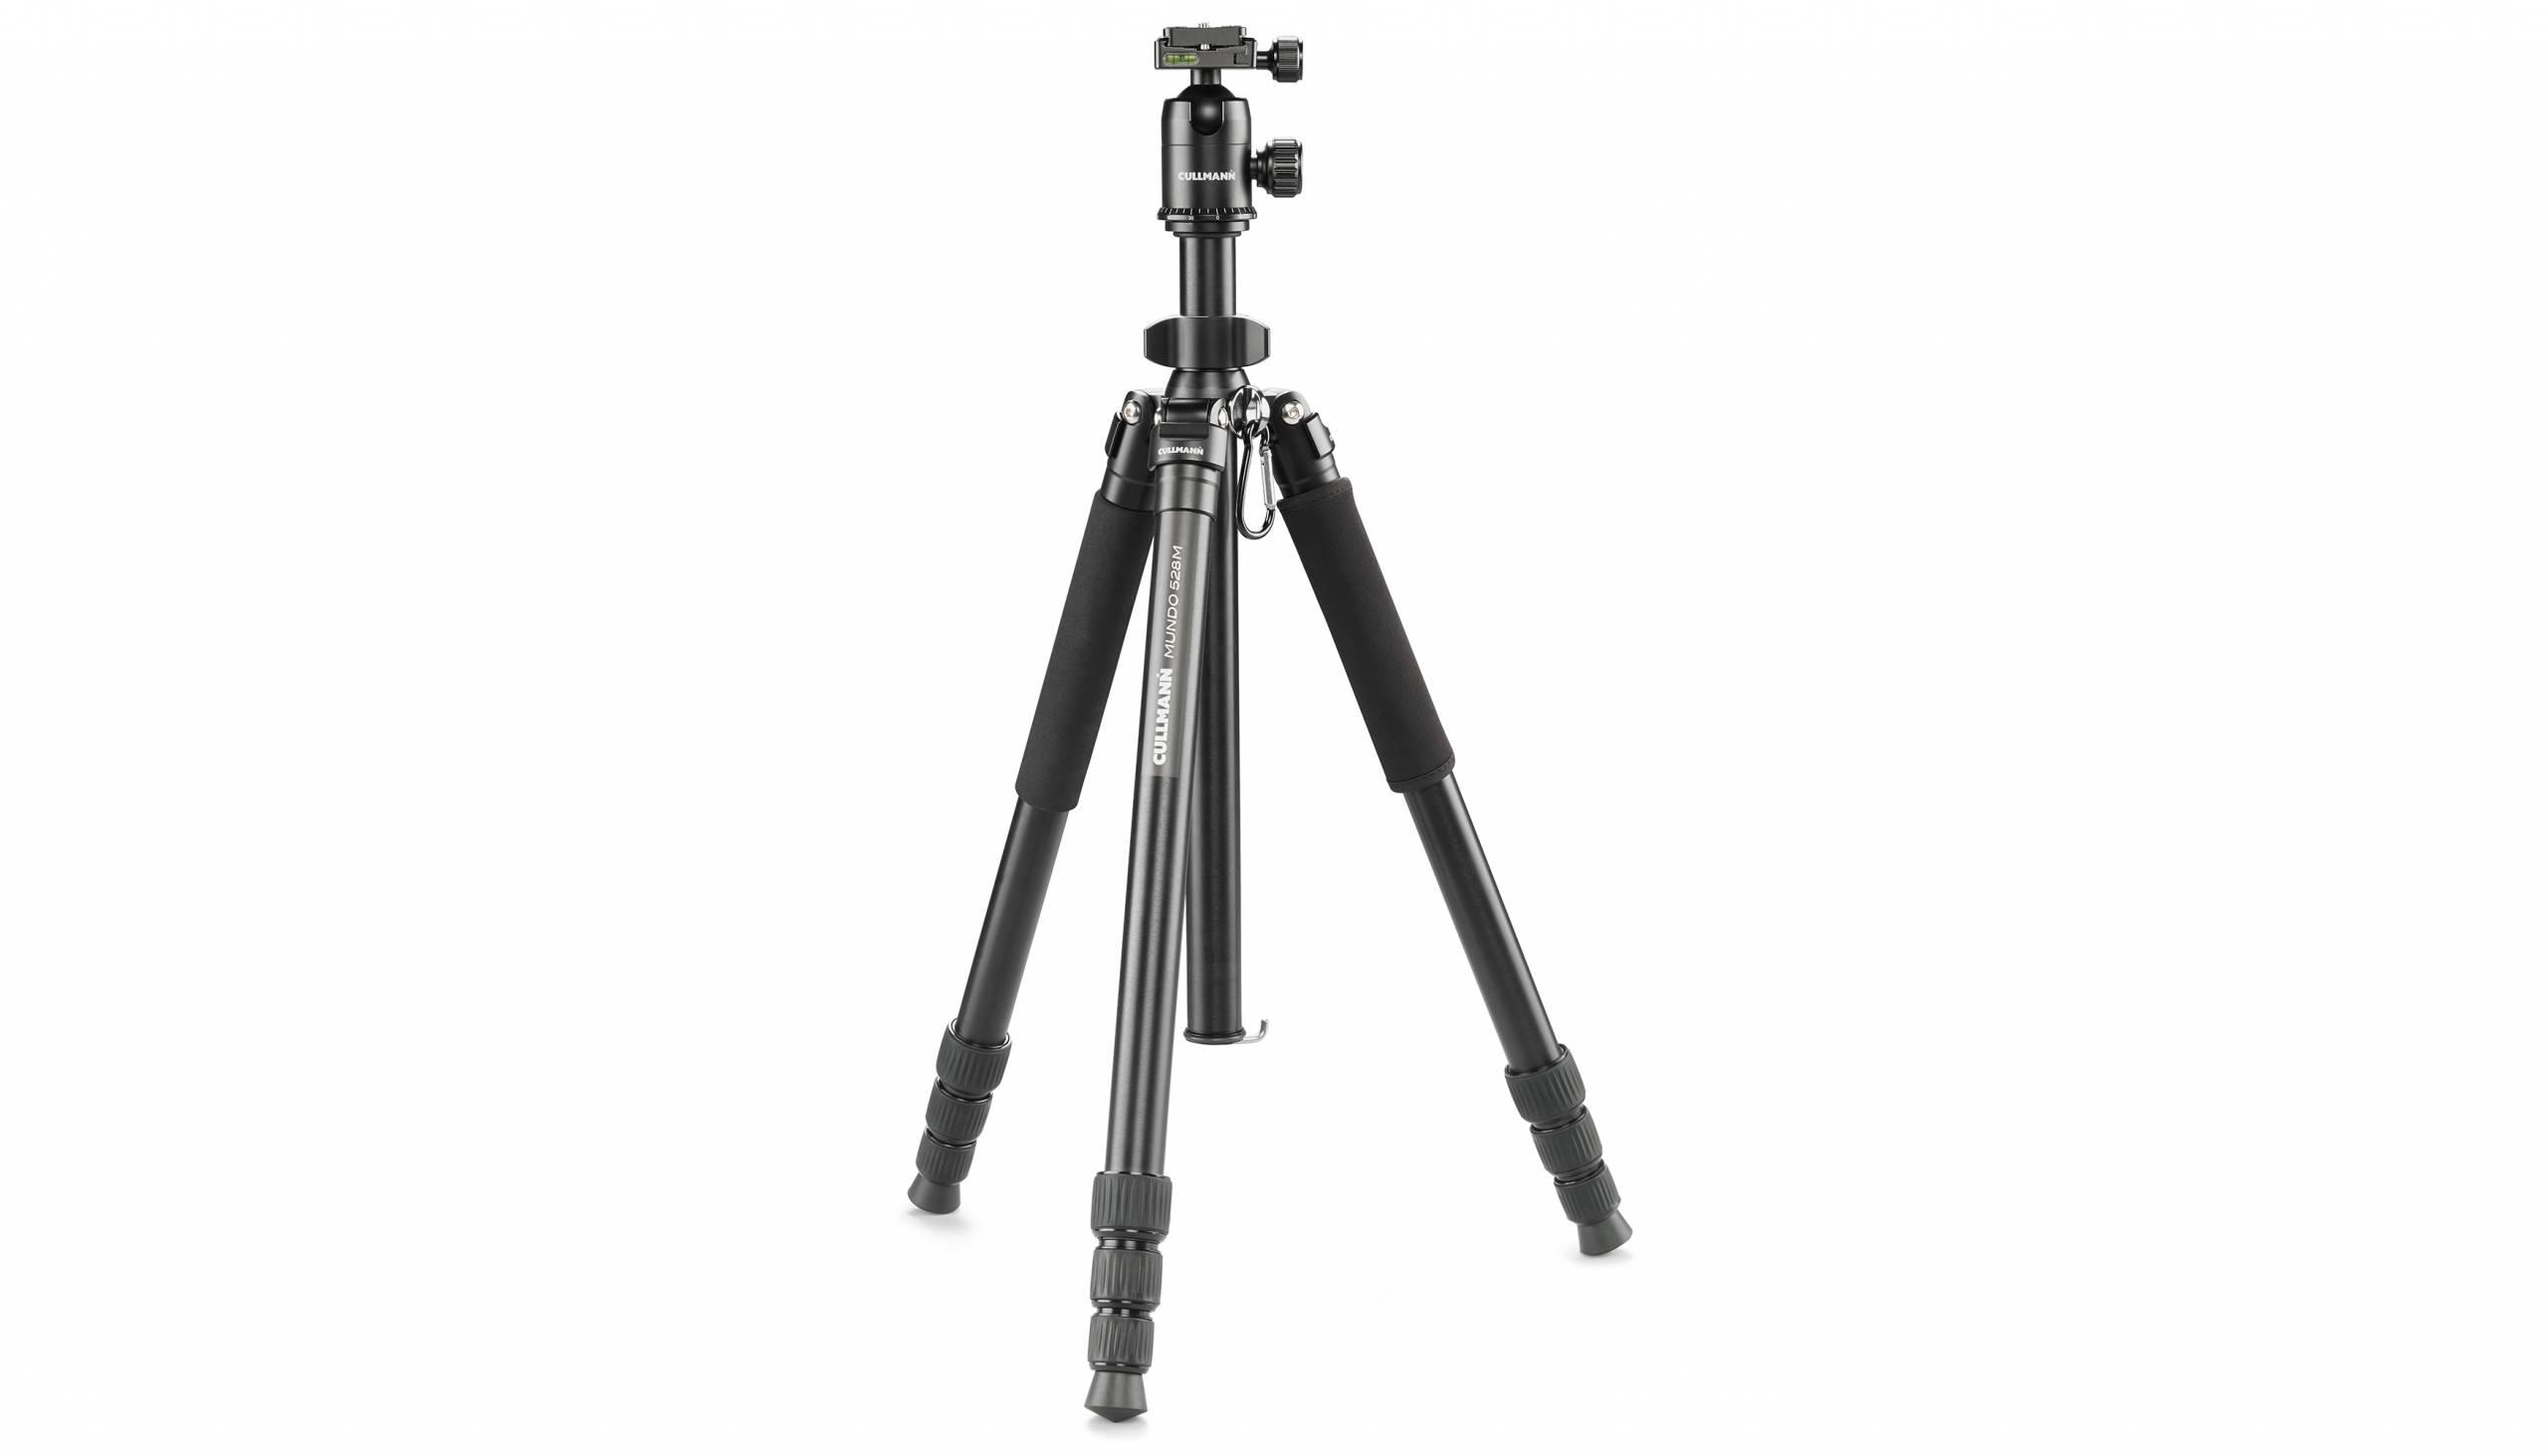 Cullmann Mundo 528M treppiede Fotocamere digitali/film 3 gamba/gambe Nero